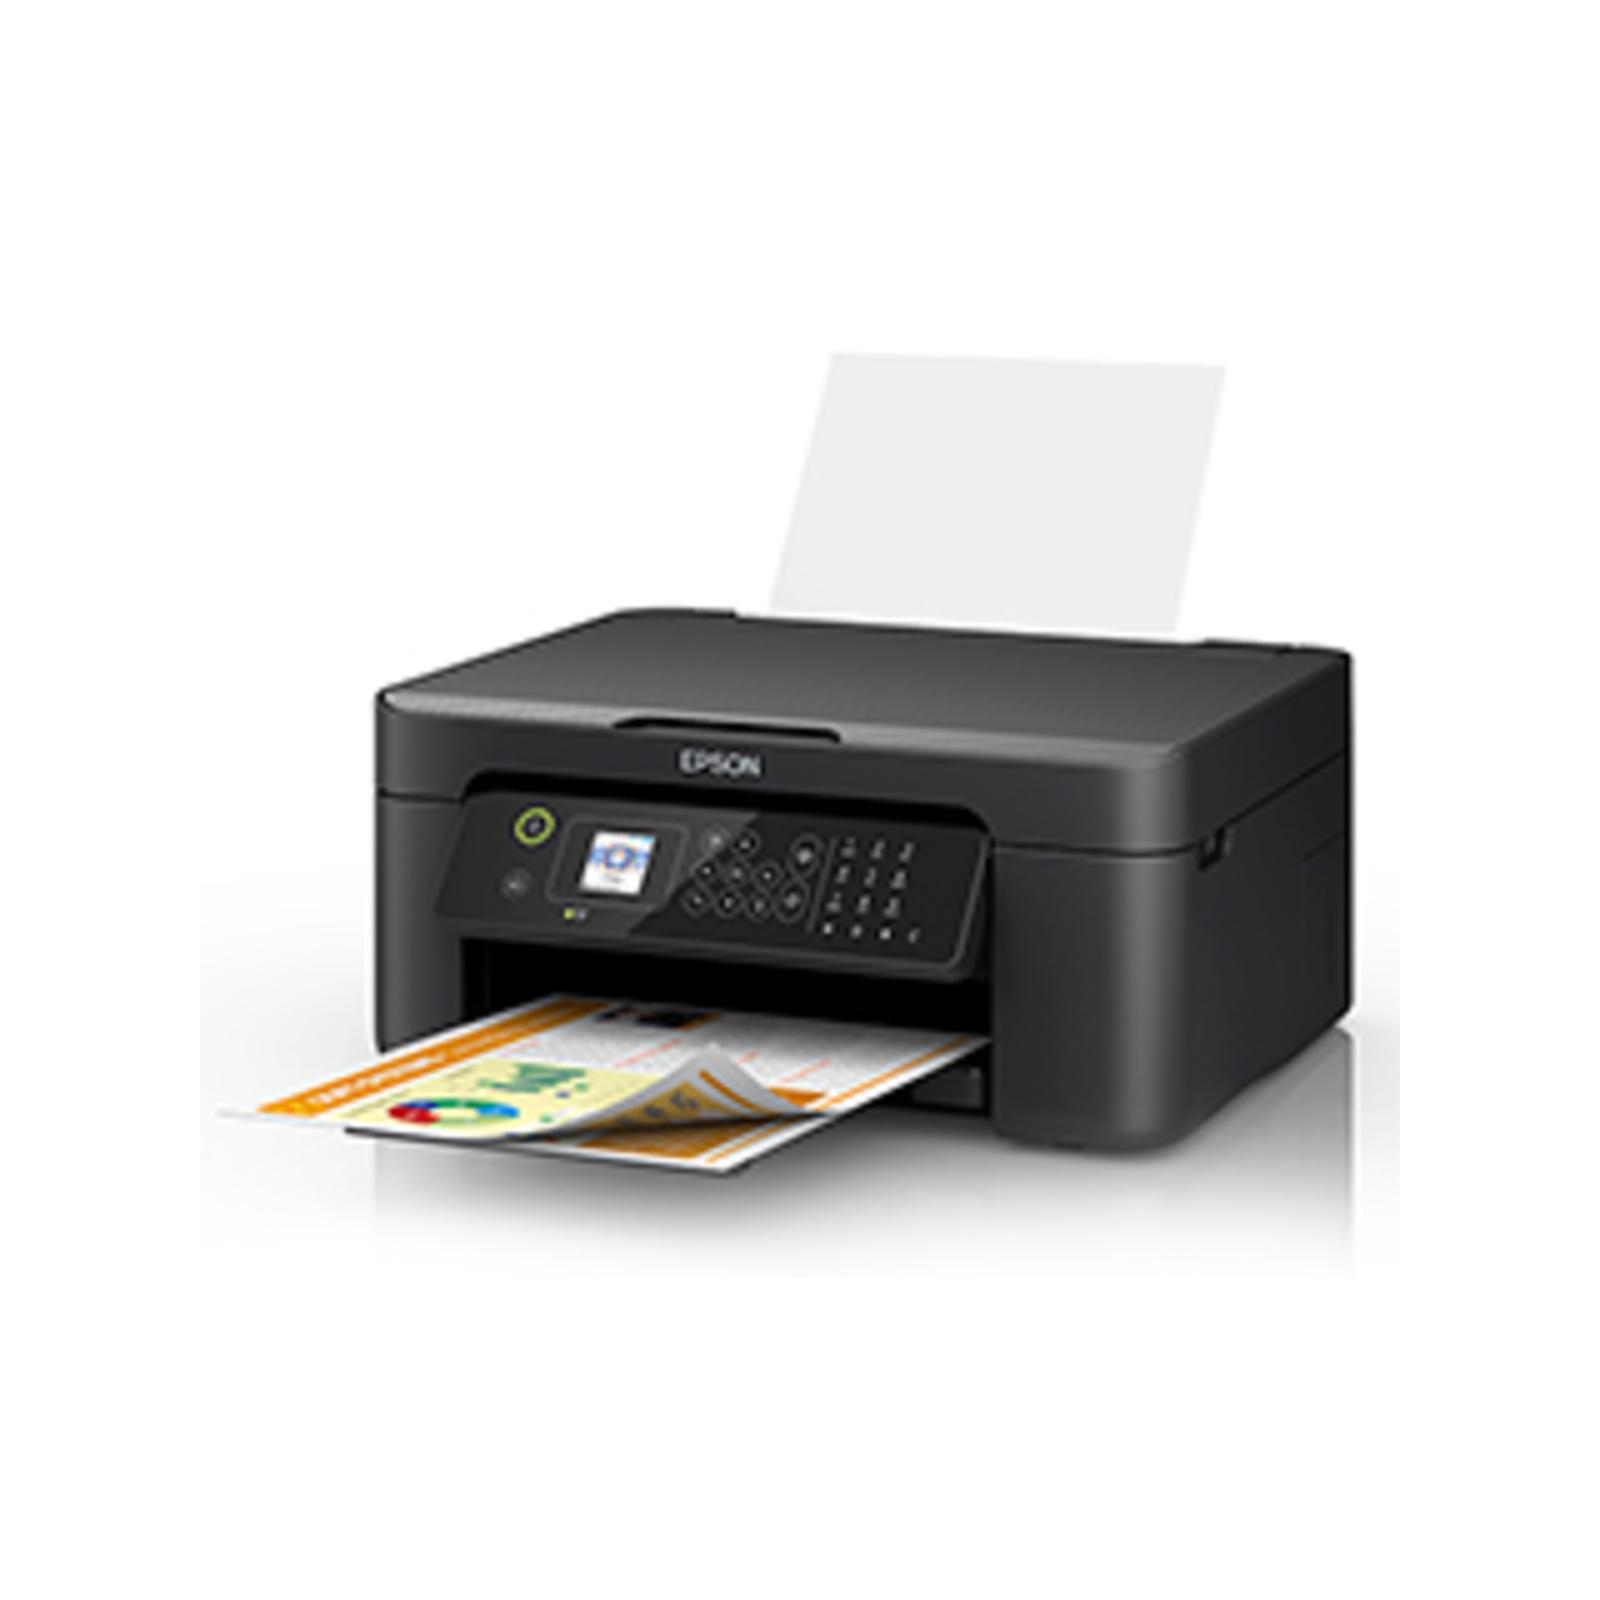 Epson WorkForce WF-2810 A4 Colour Inkjet MFP - Compact Wi-Fi Multifunction Printer